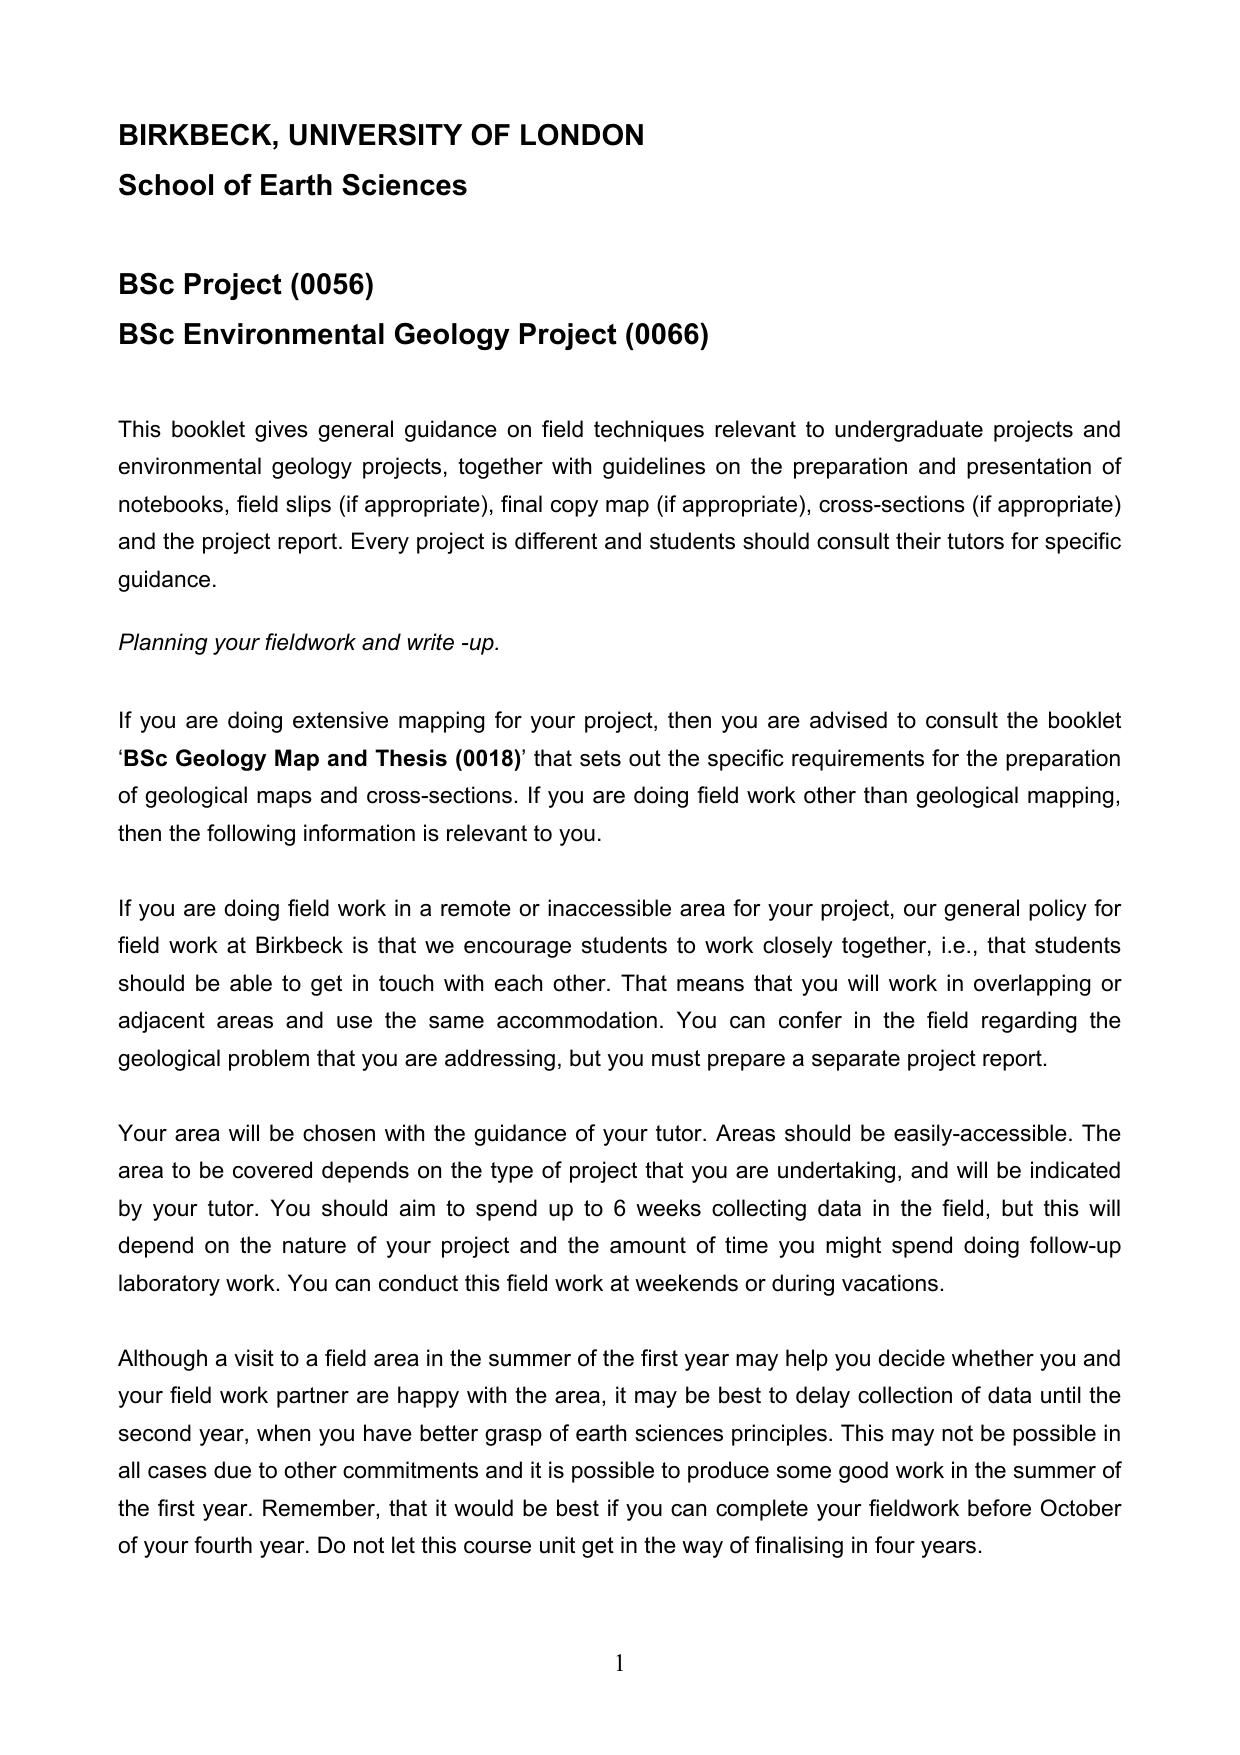 bsc project guidelines birkbeck university of london